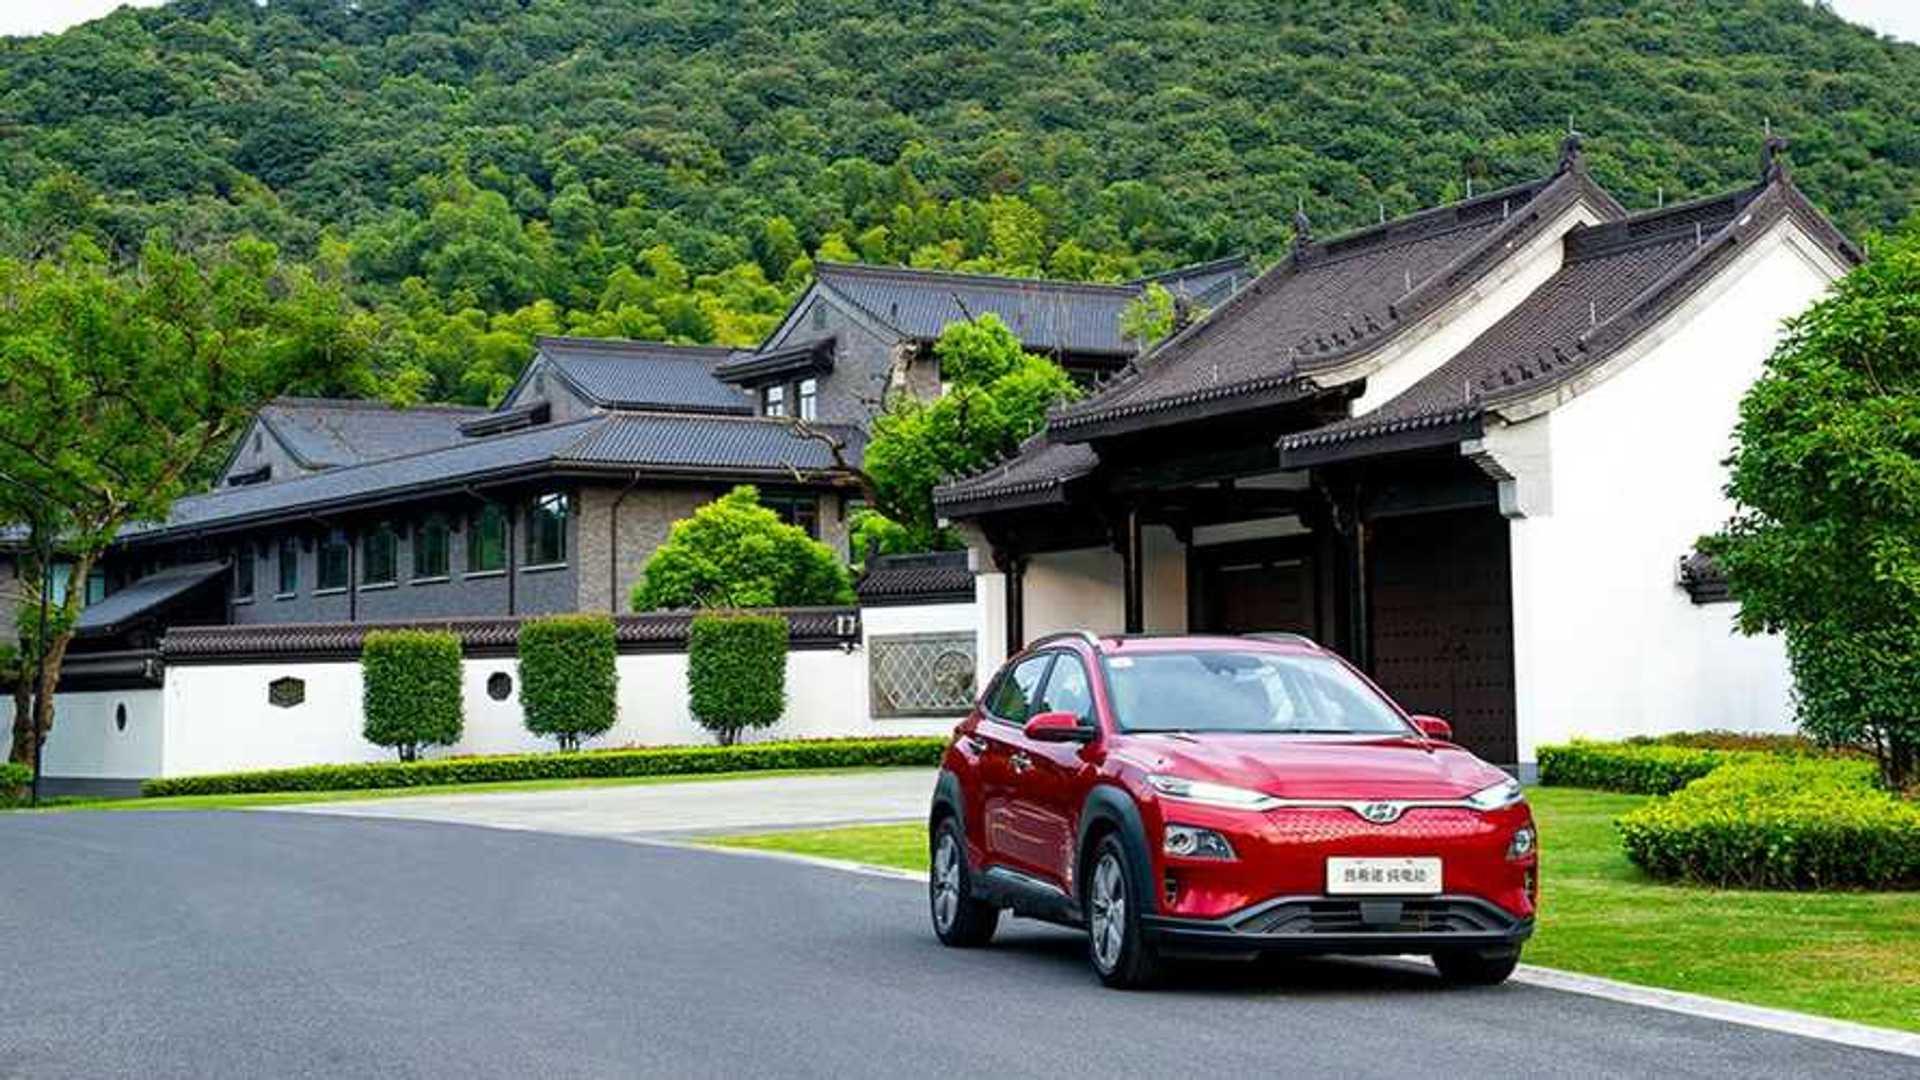 Hyundai Sells The Kona Electric In China As Encino EV For